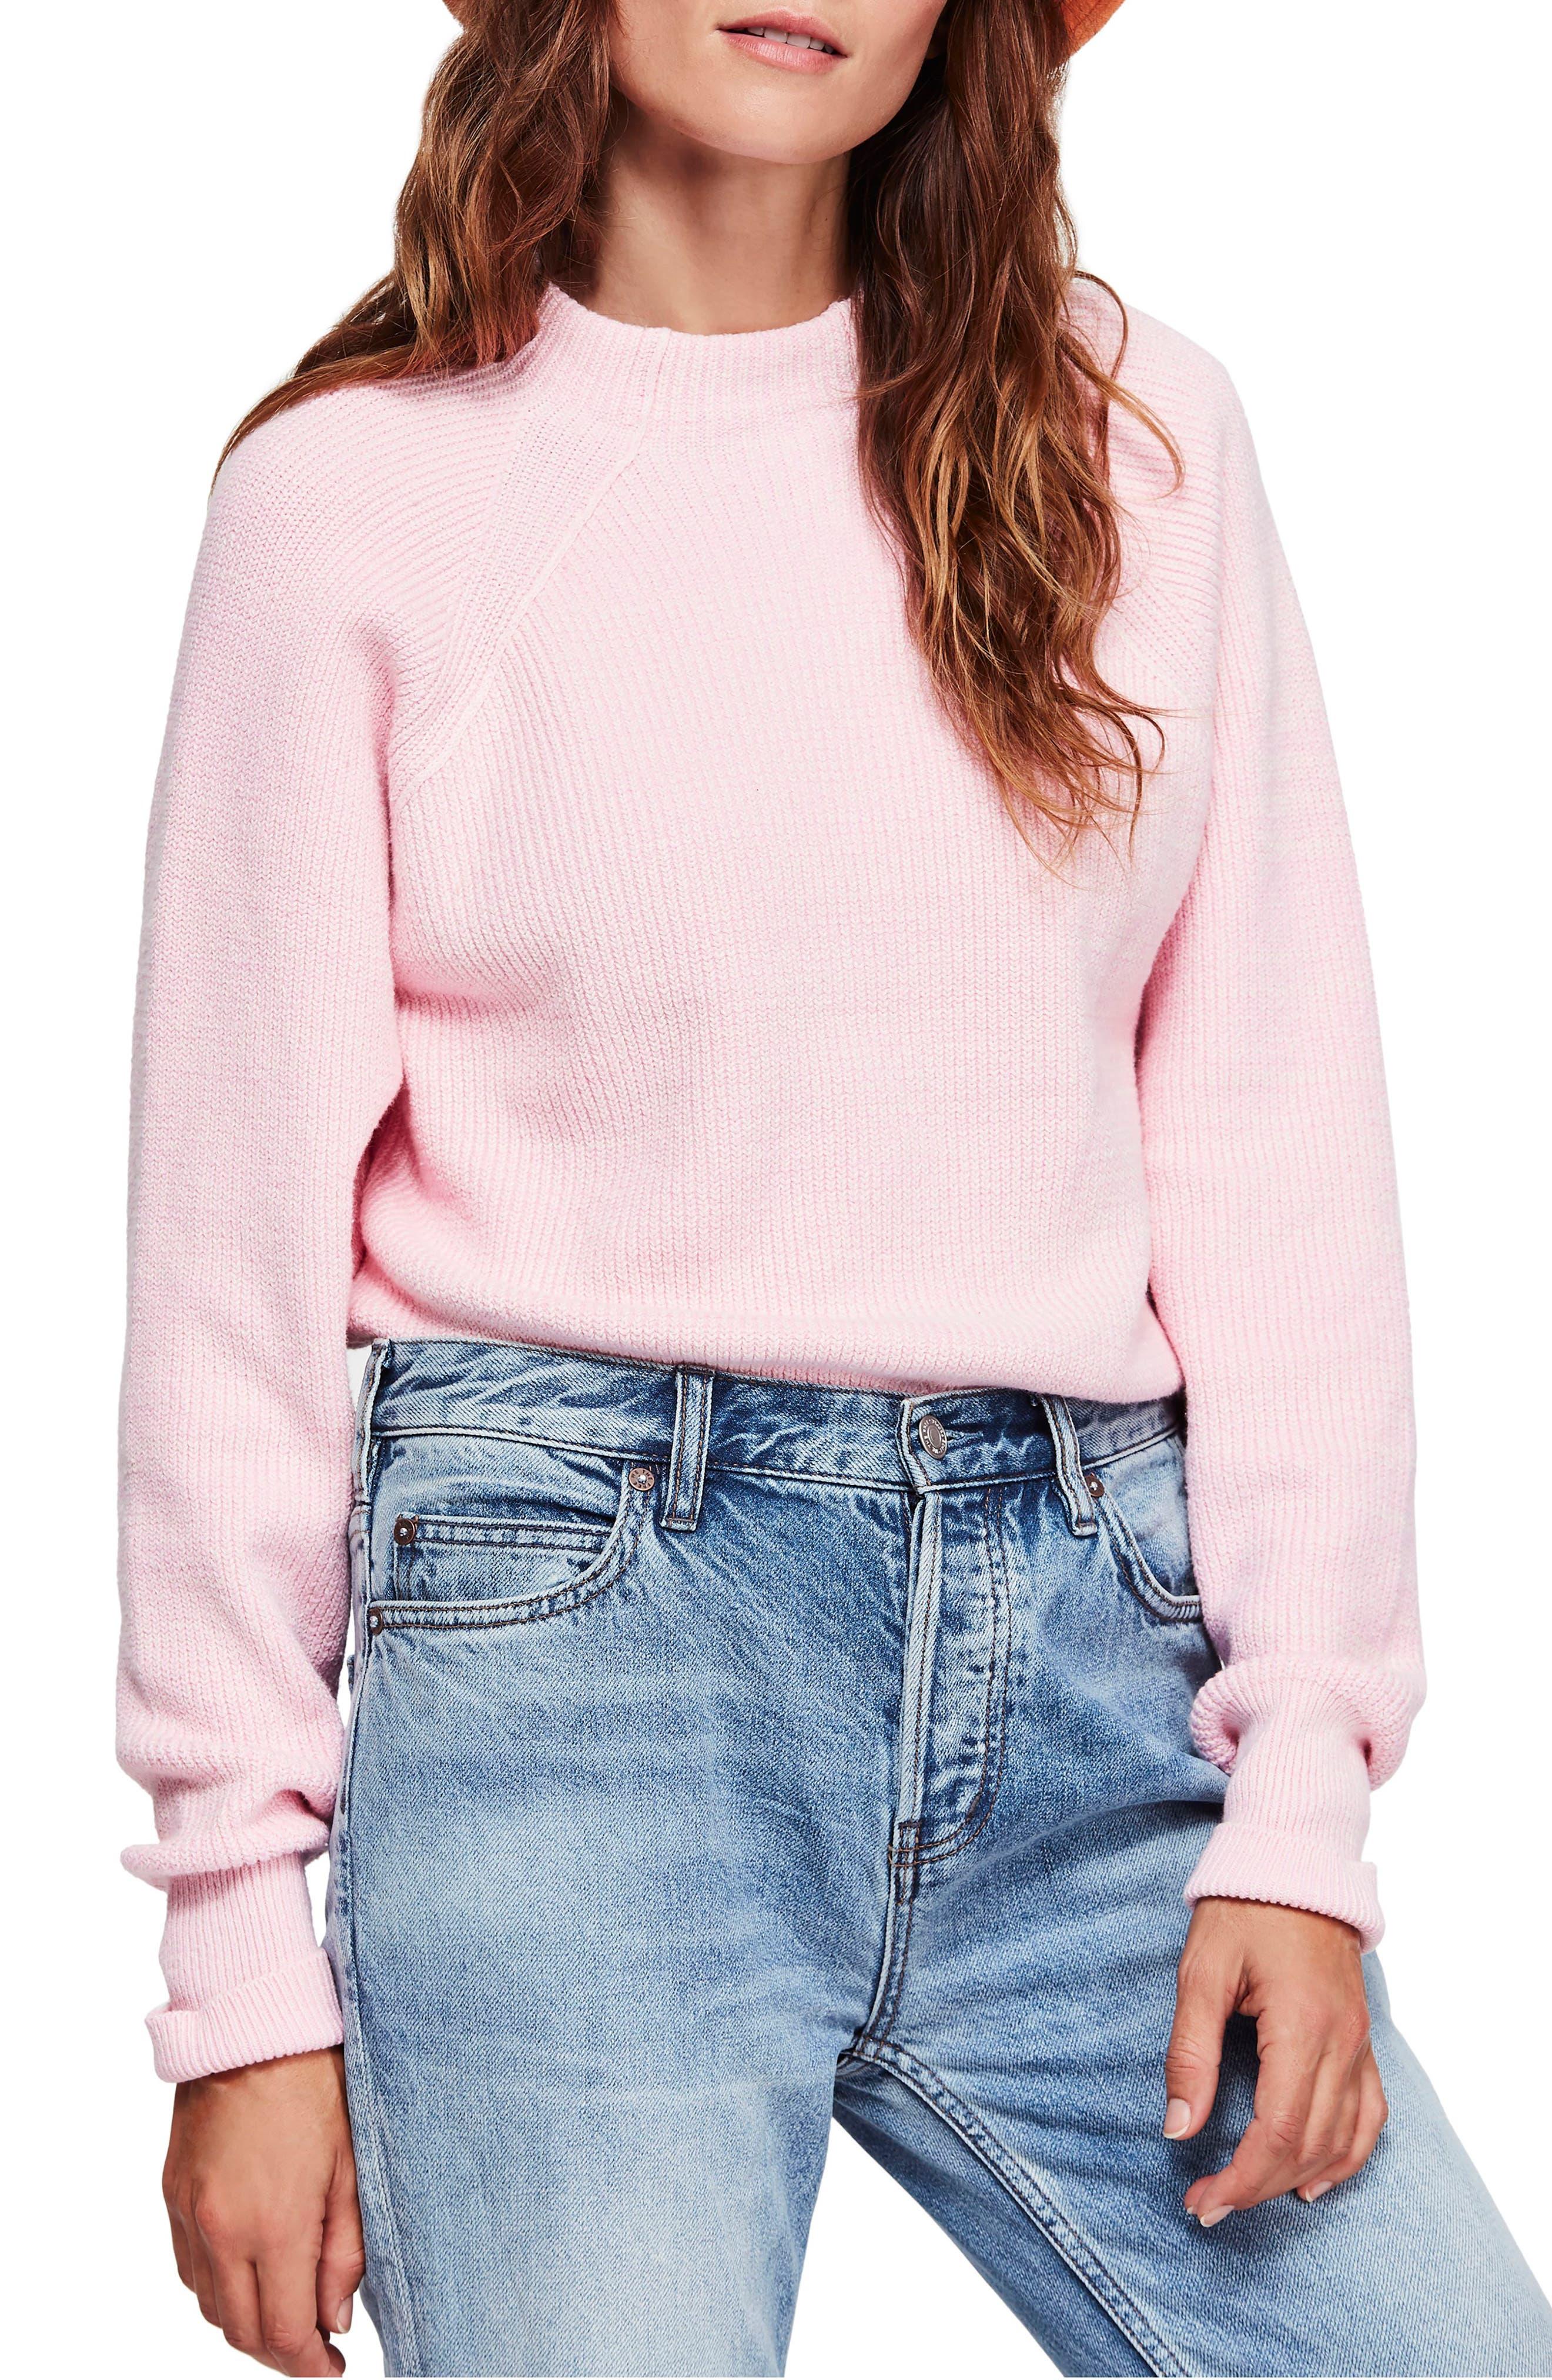 Too Good Sweater,                             Main thumbnail 1, color,                             PINK